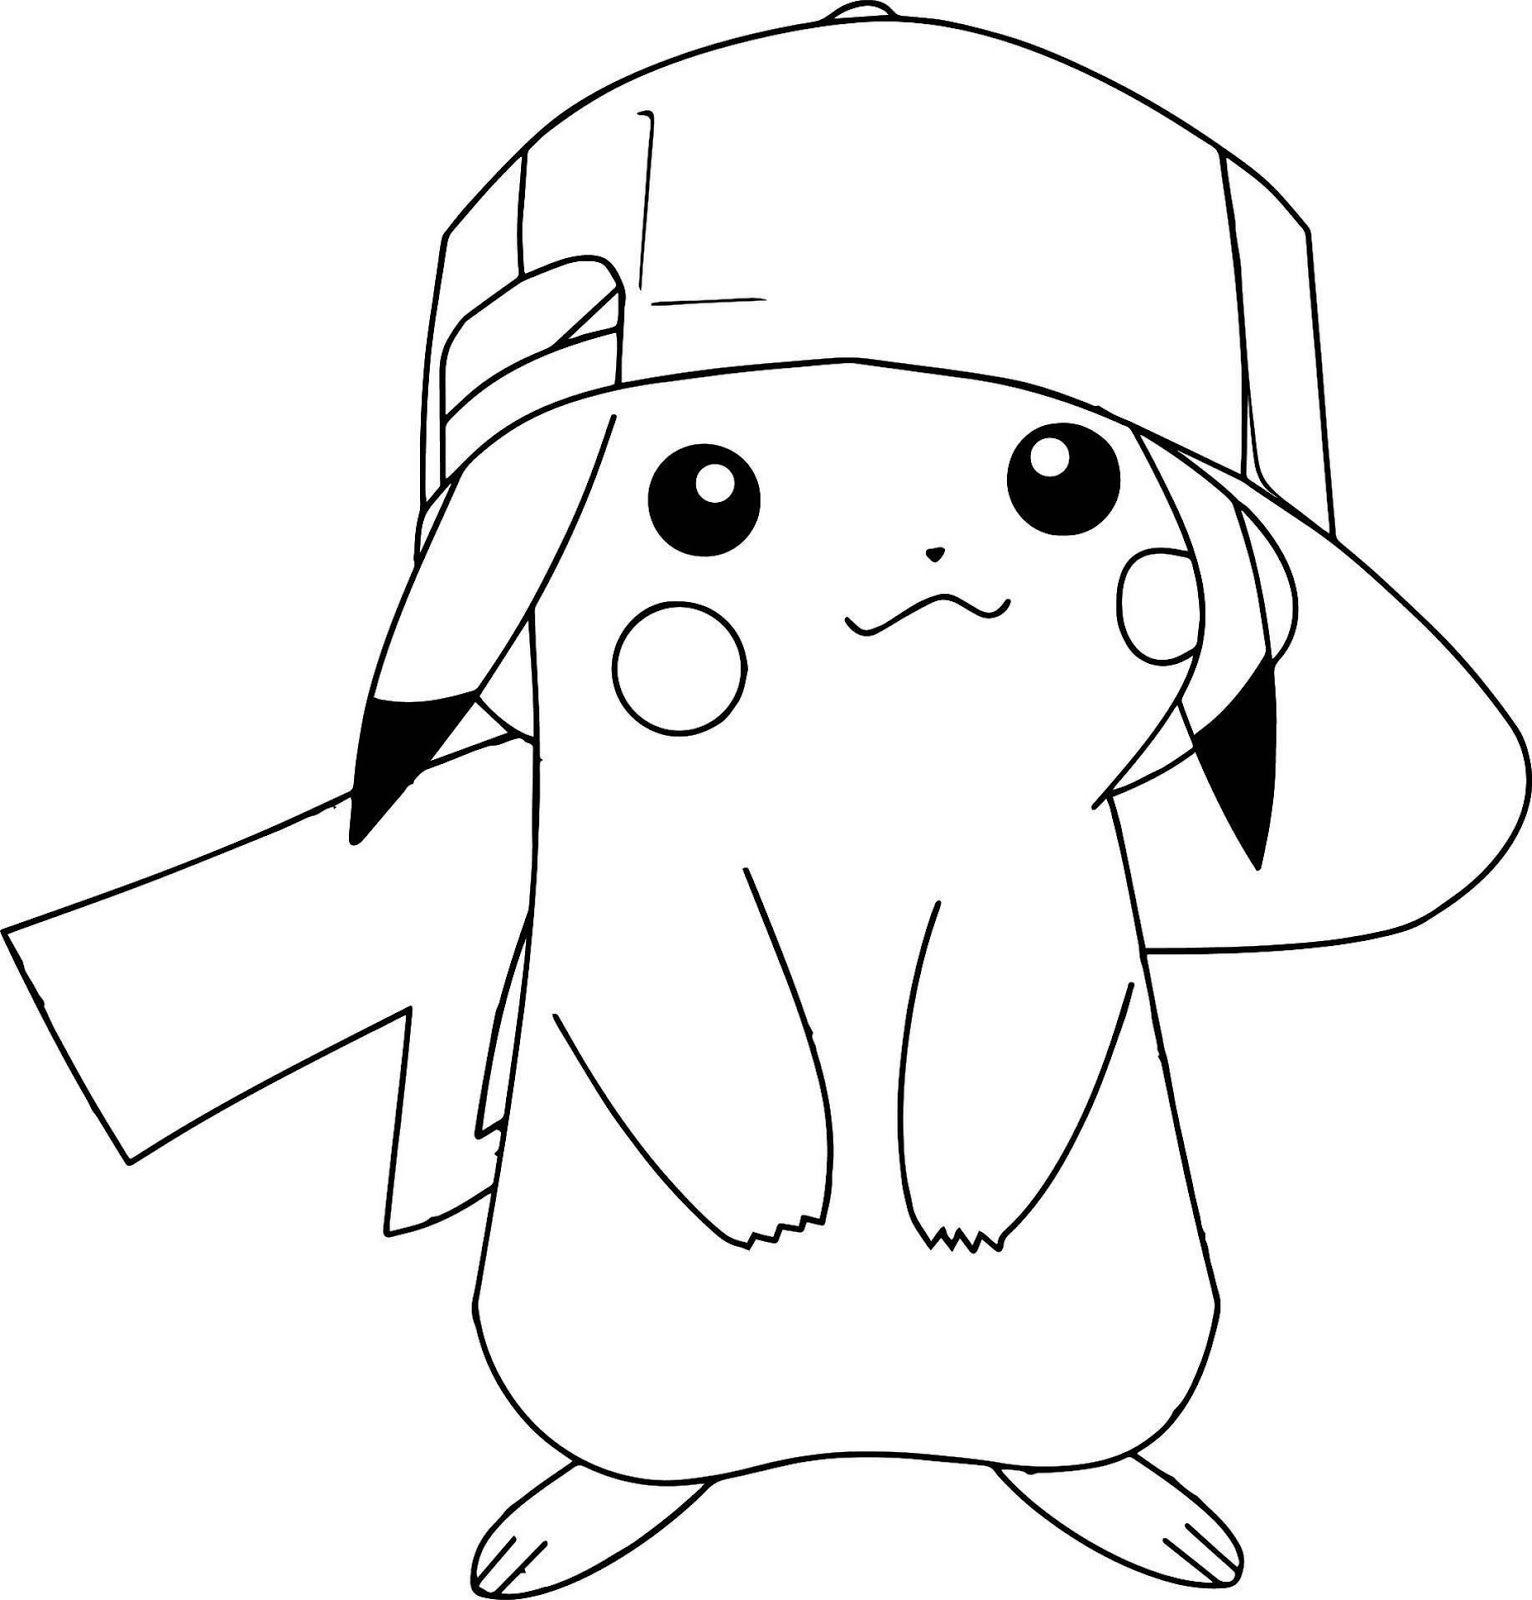 Cute Pokemon Go Pikachu With Ash S Hat Coloring Pages In 2020 Pikachu Coloring Page Cartoon Coloring Pages Pokemon Coloring Sheets